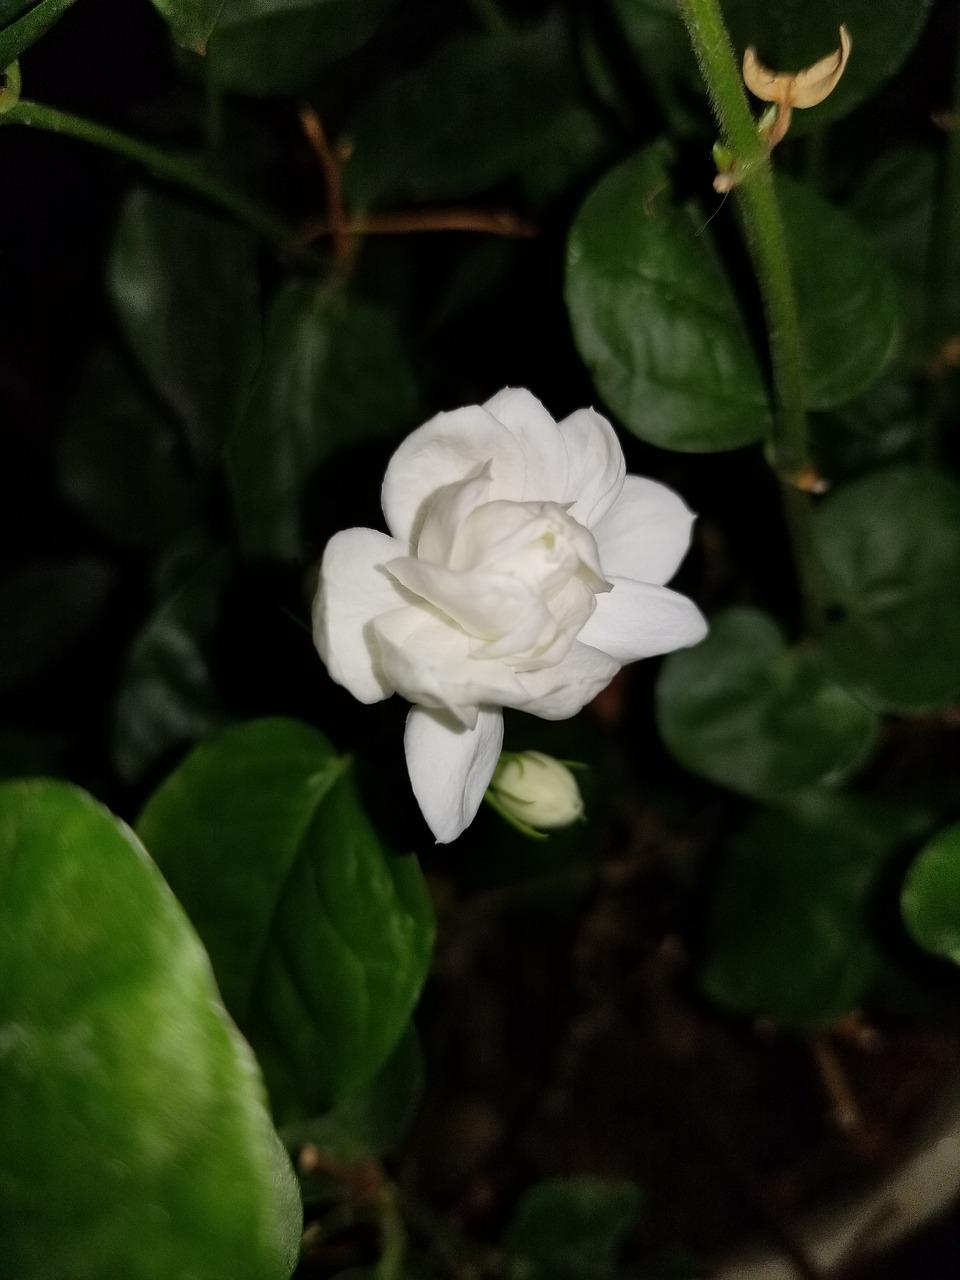 Beautifulflowerselegance Free Photo From Needpix